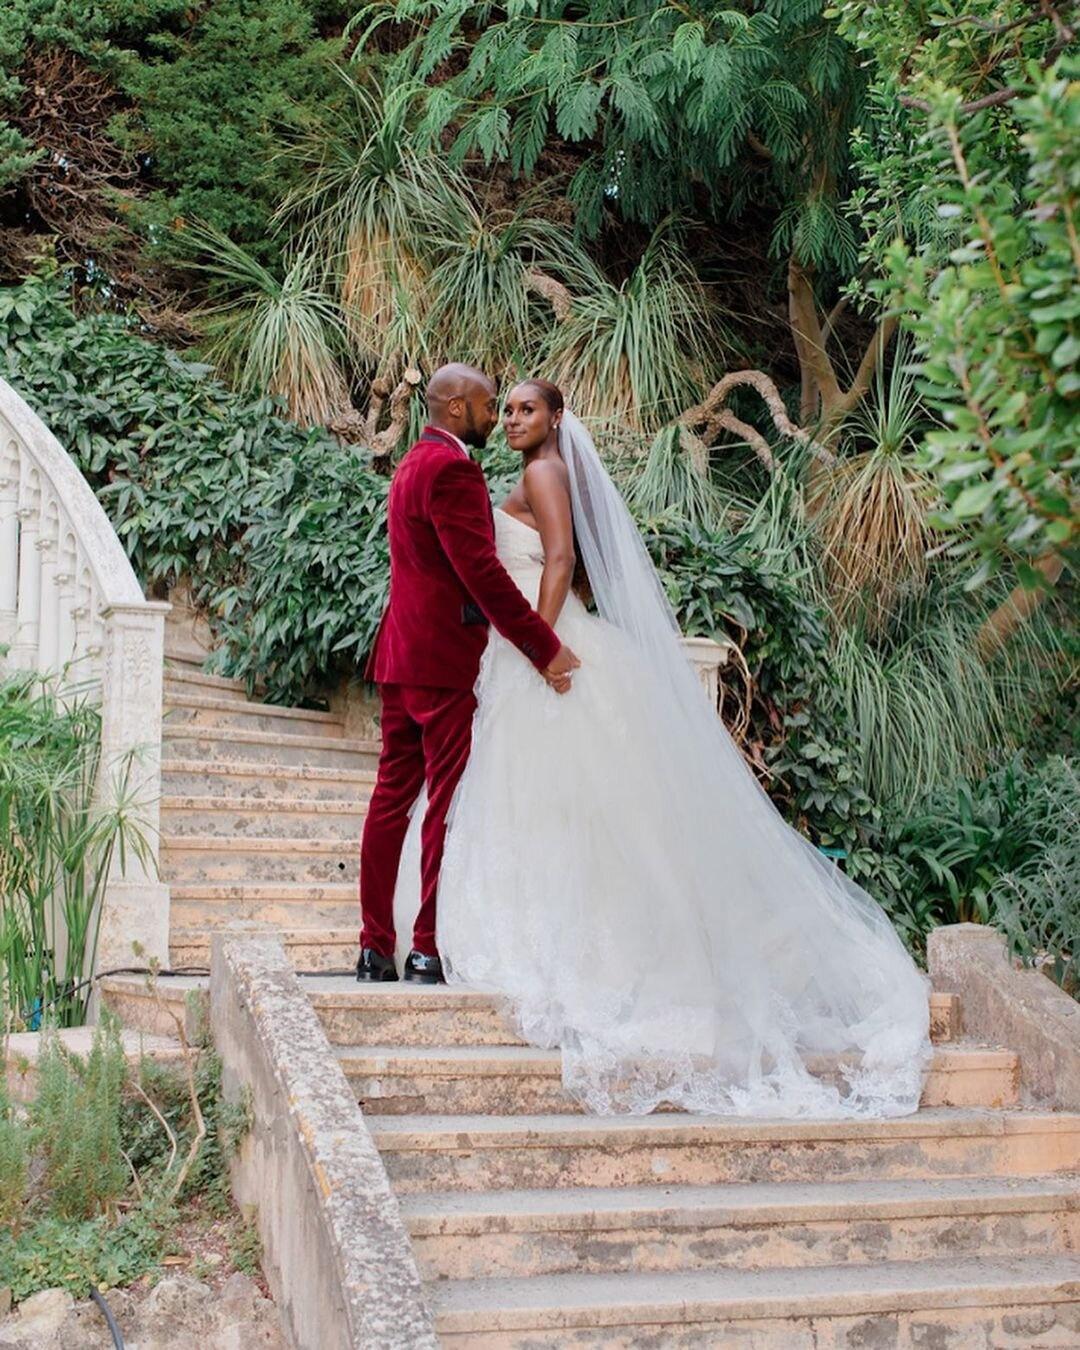 Issa Rae stuns on her wedding day